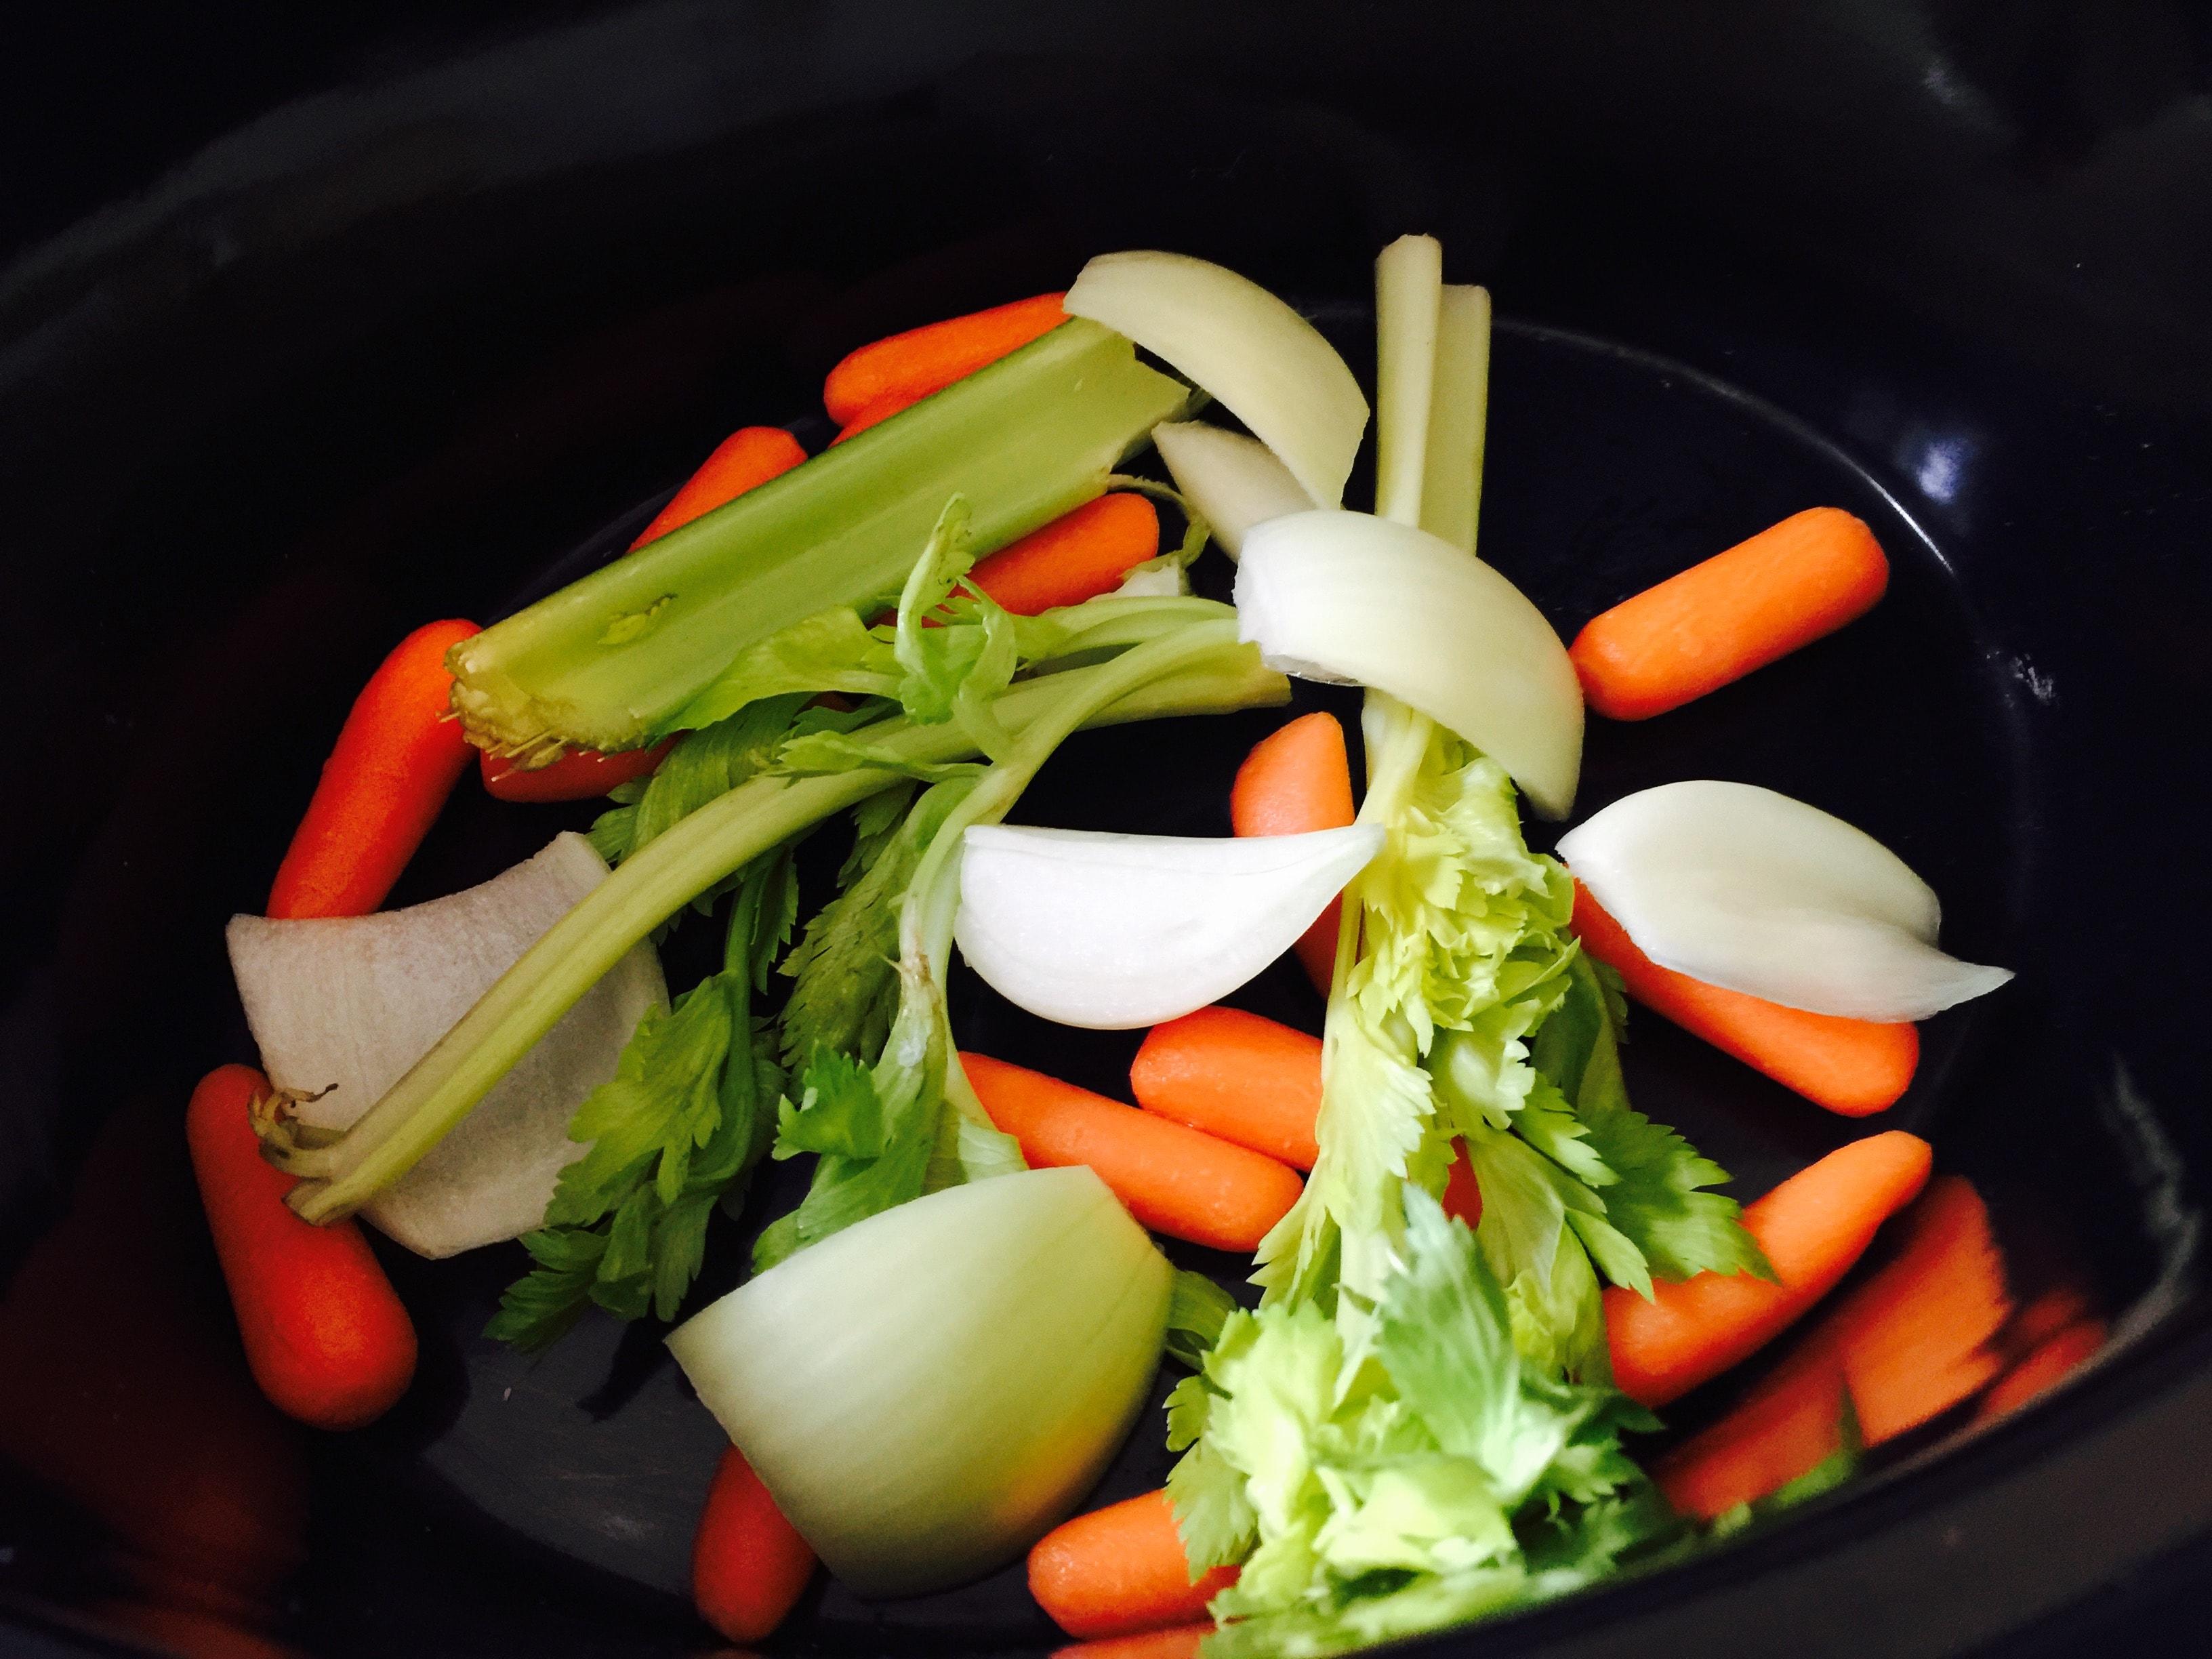 vegetables needed to make homemade turkey stock